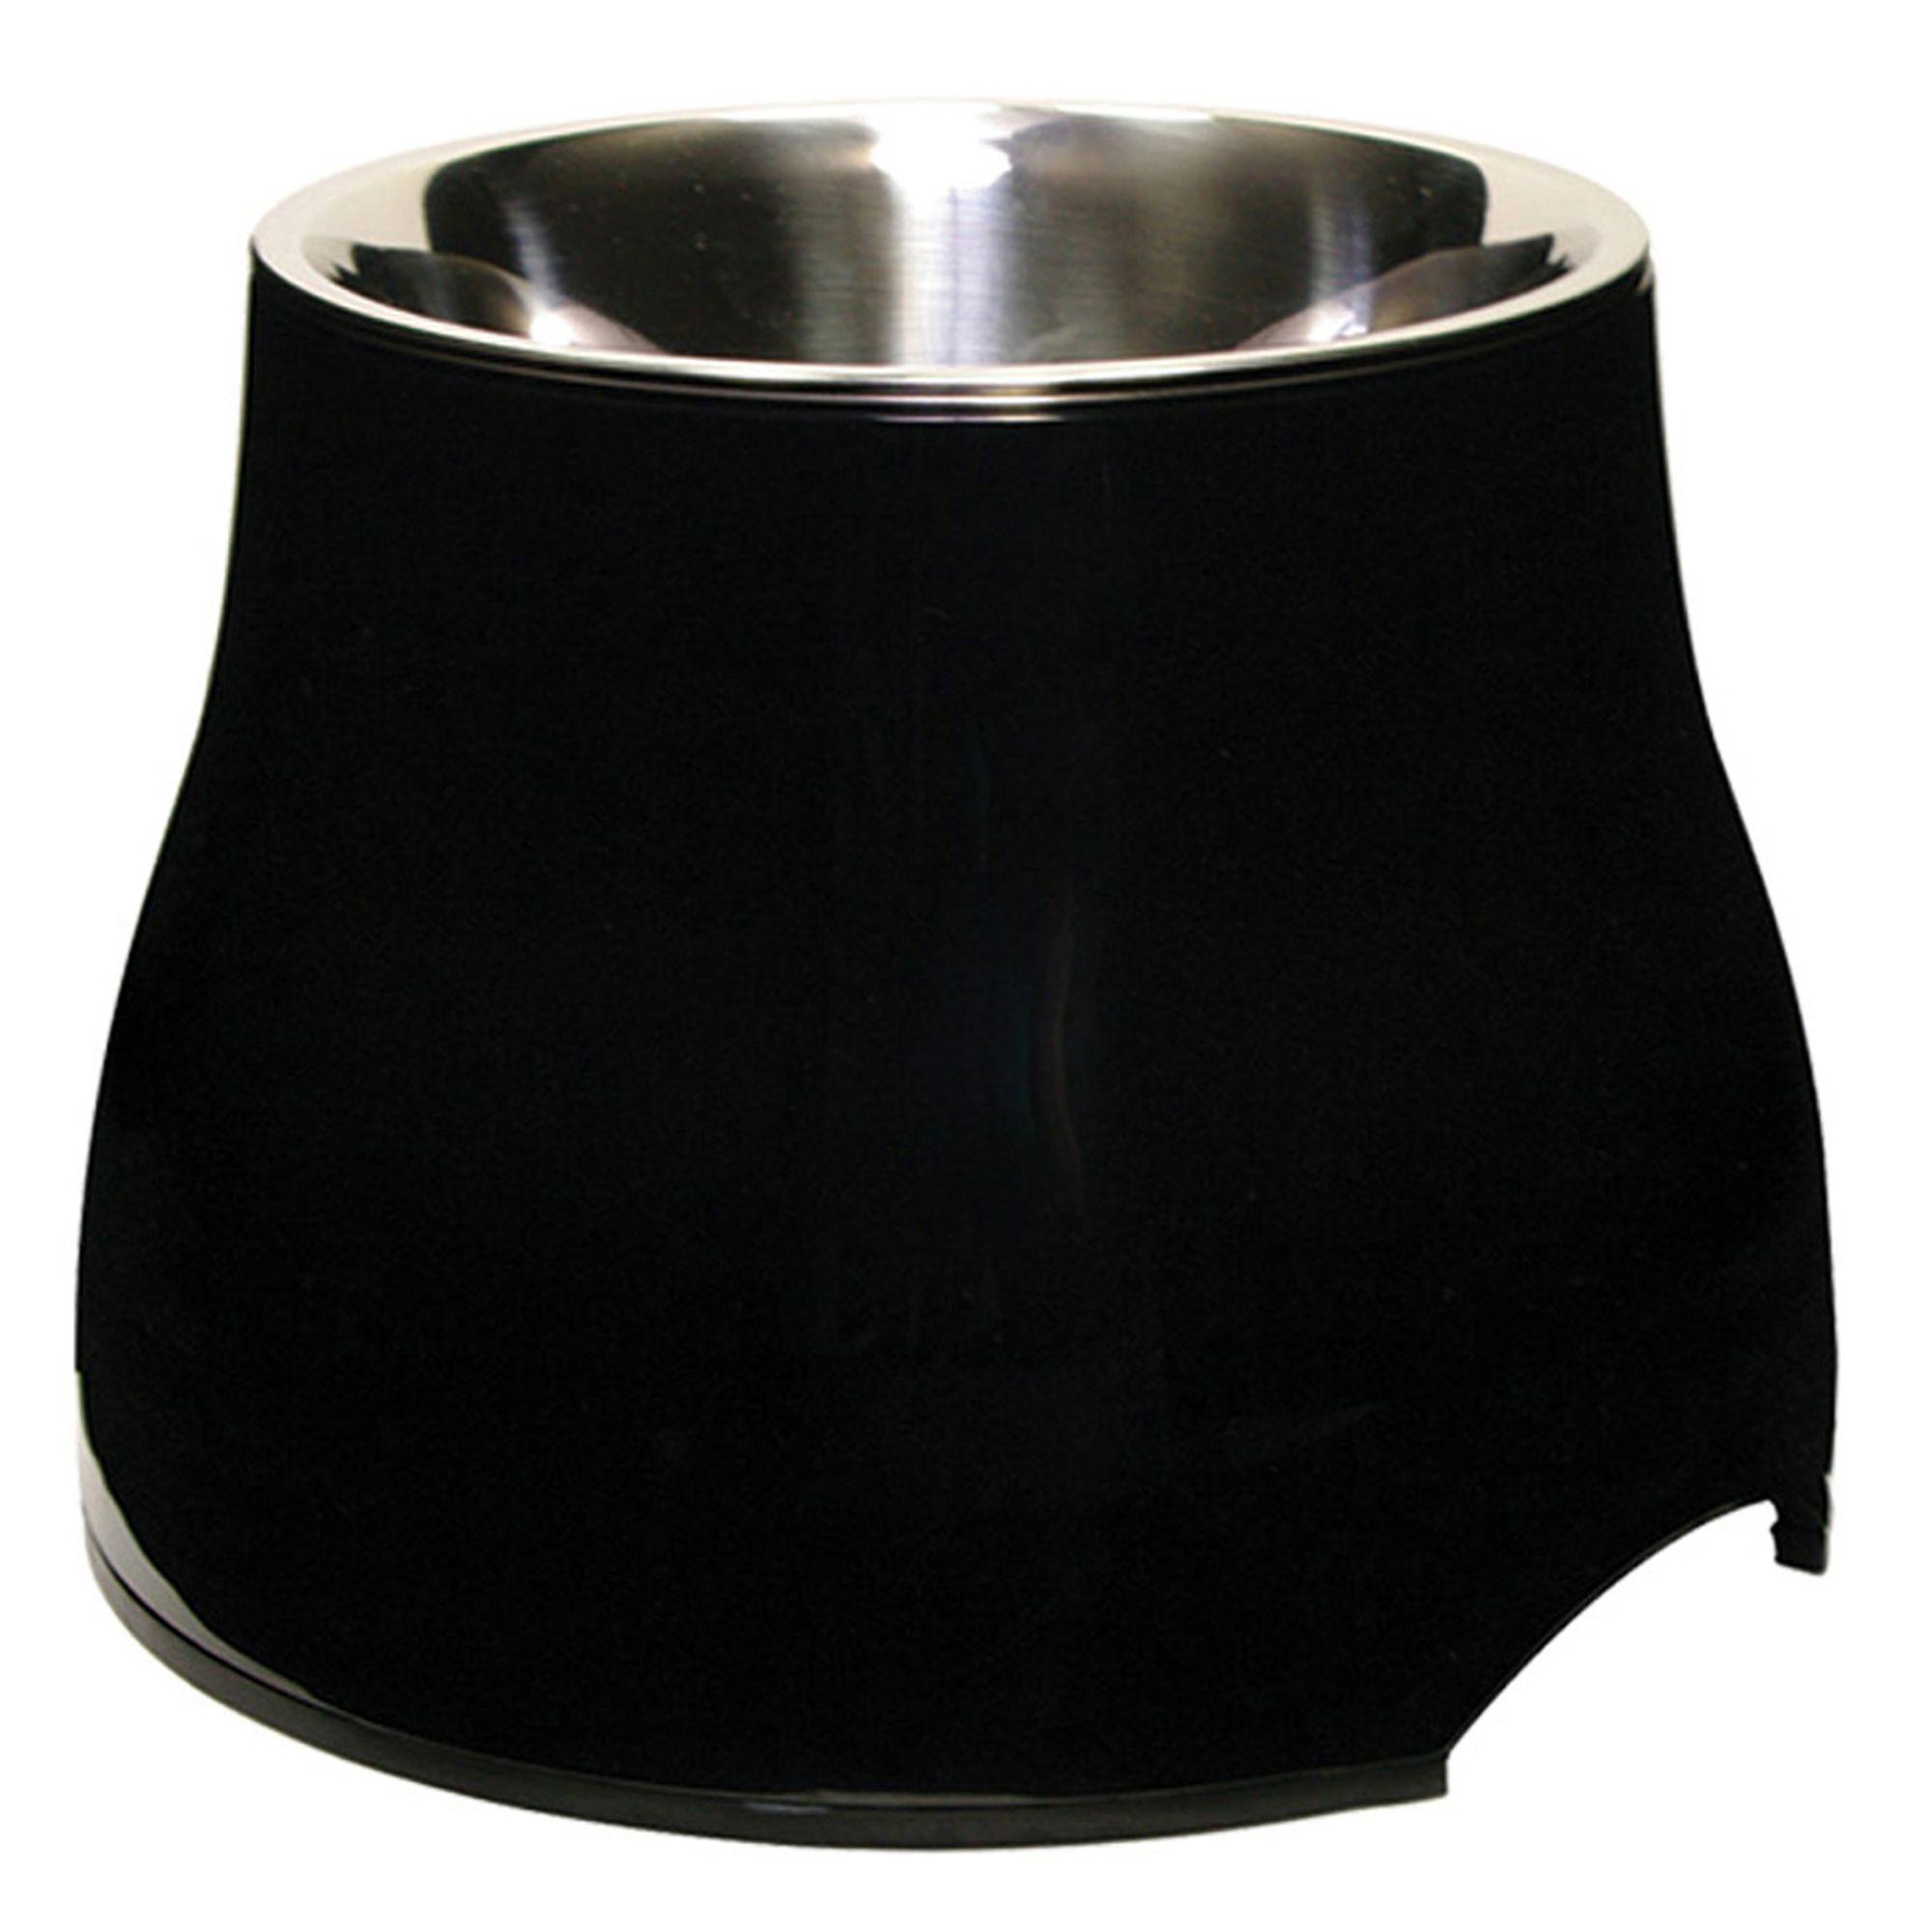 Dogit Elevated Dog Bowl Size 10.1 Fl Oz Black